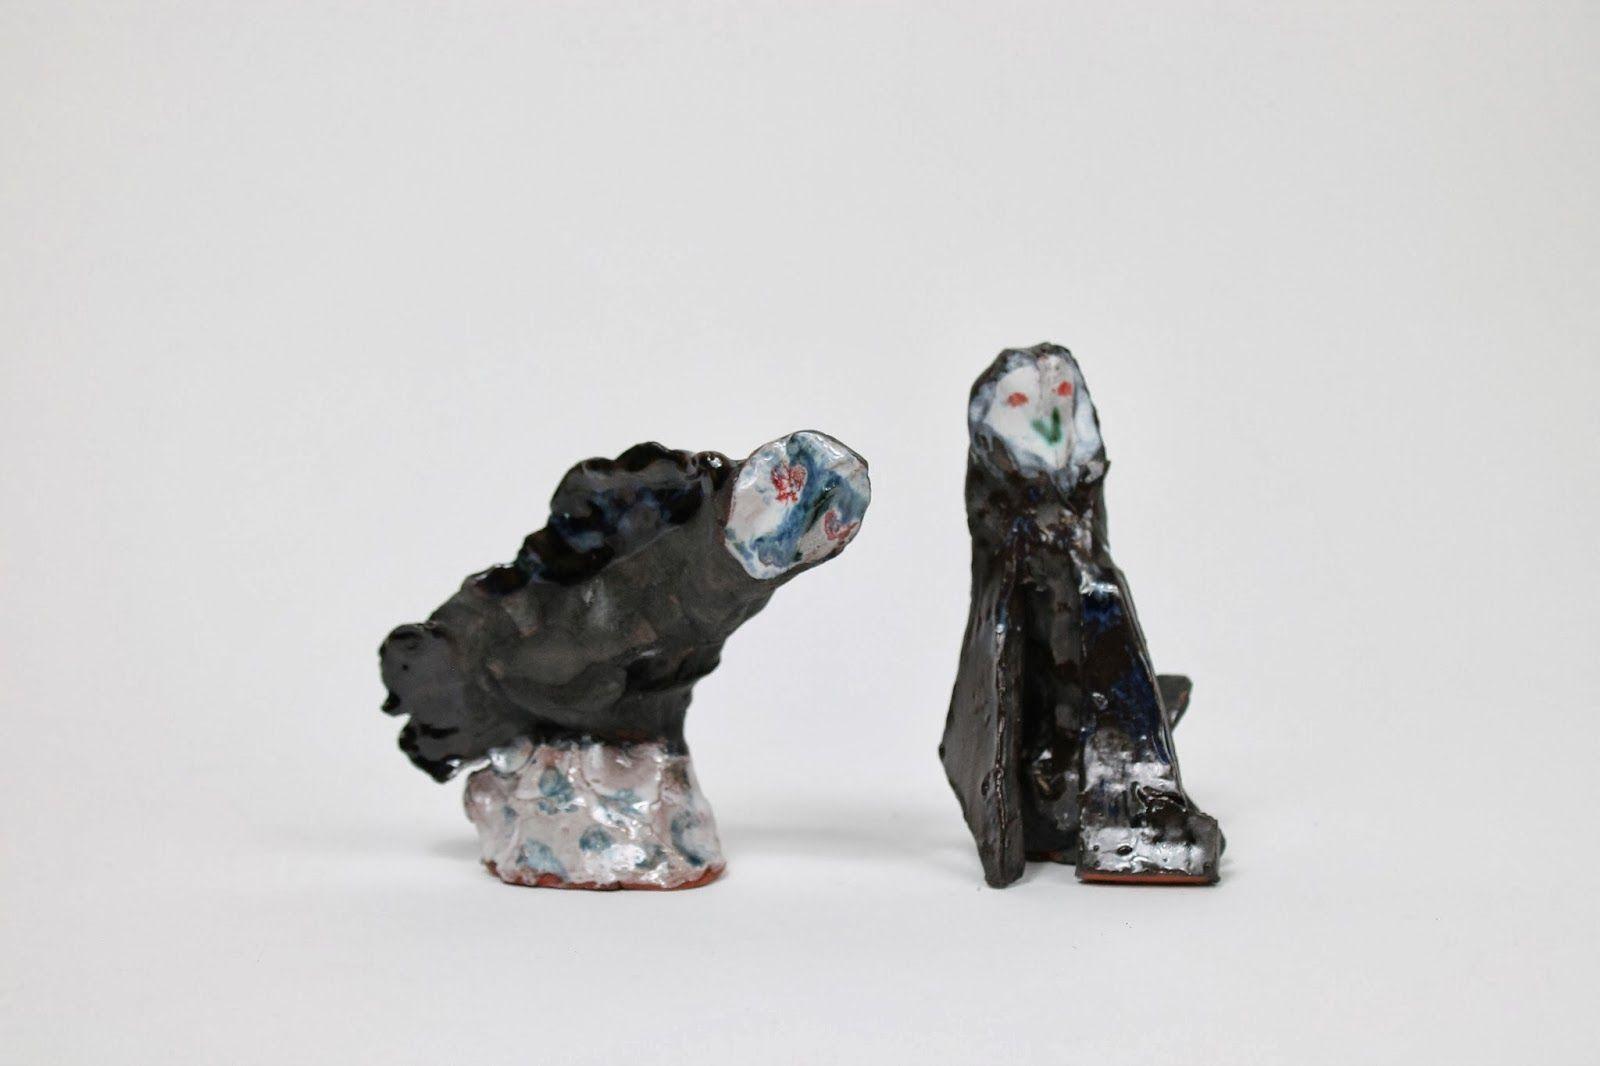 Owl ceramics by Rose de Borman